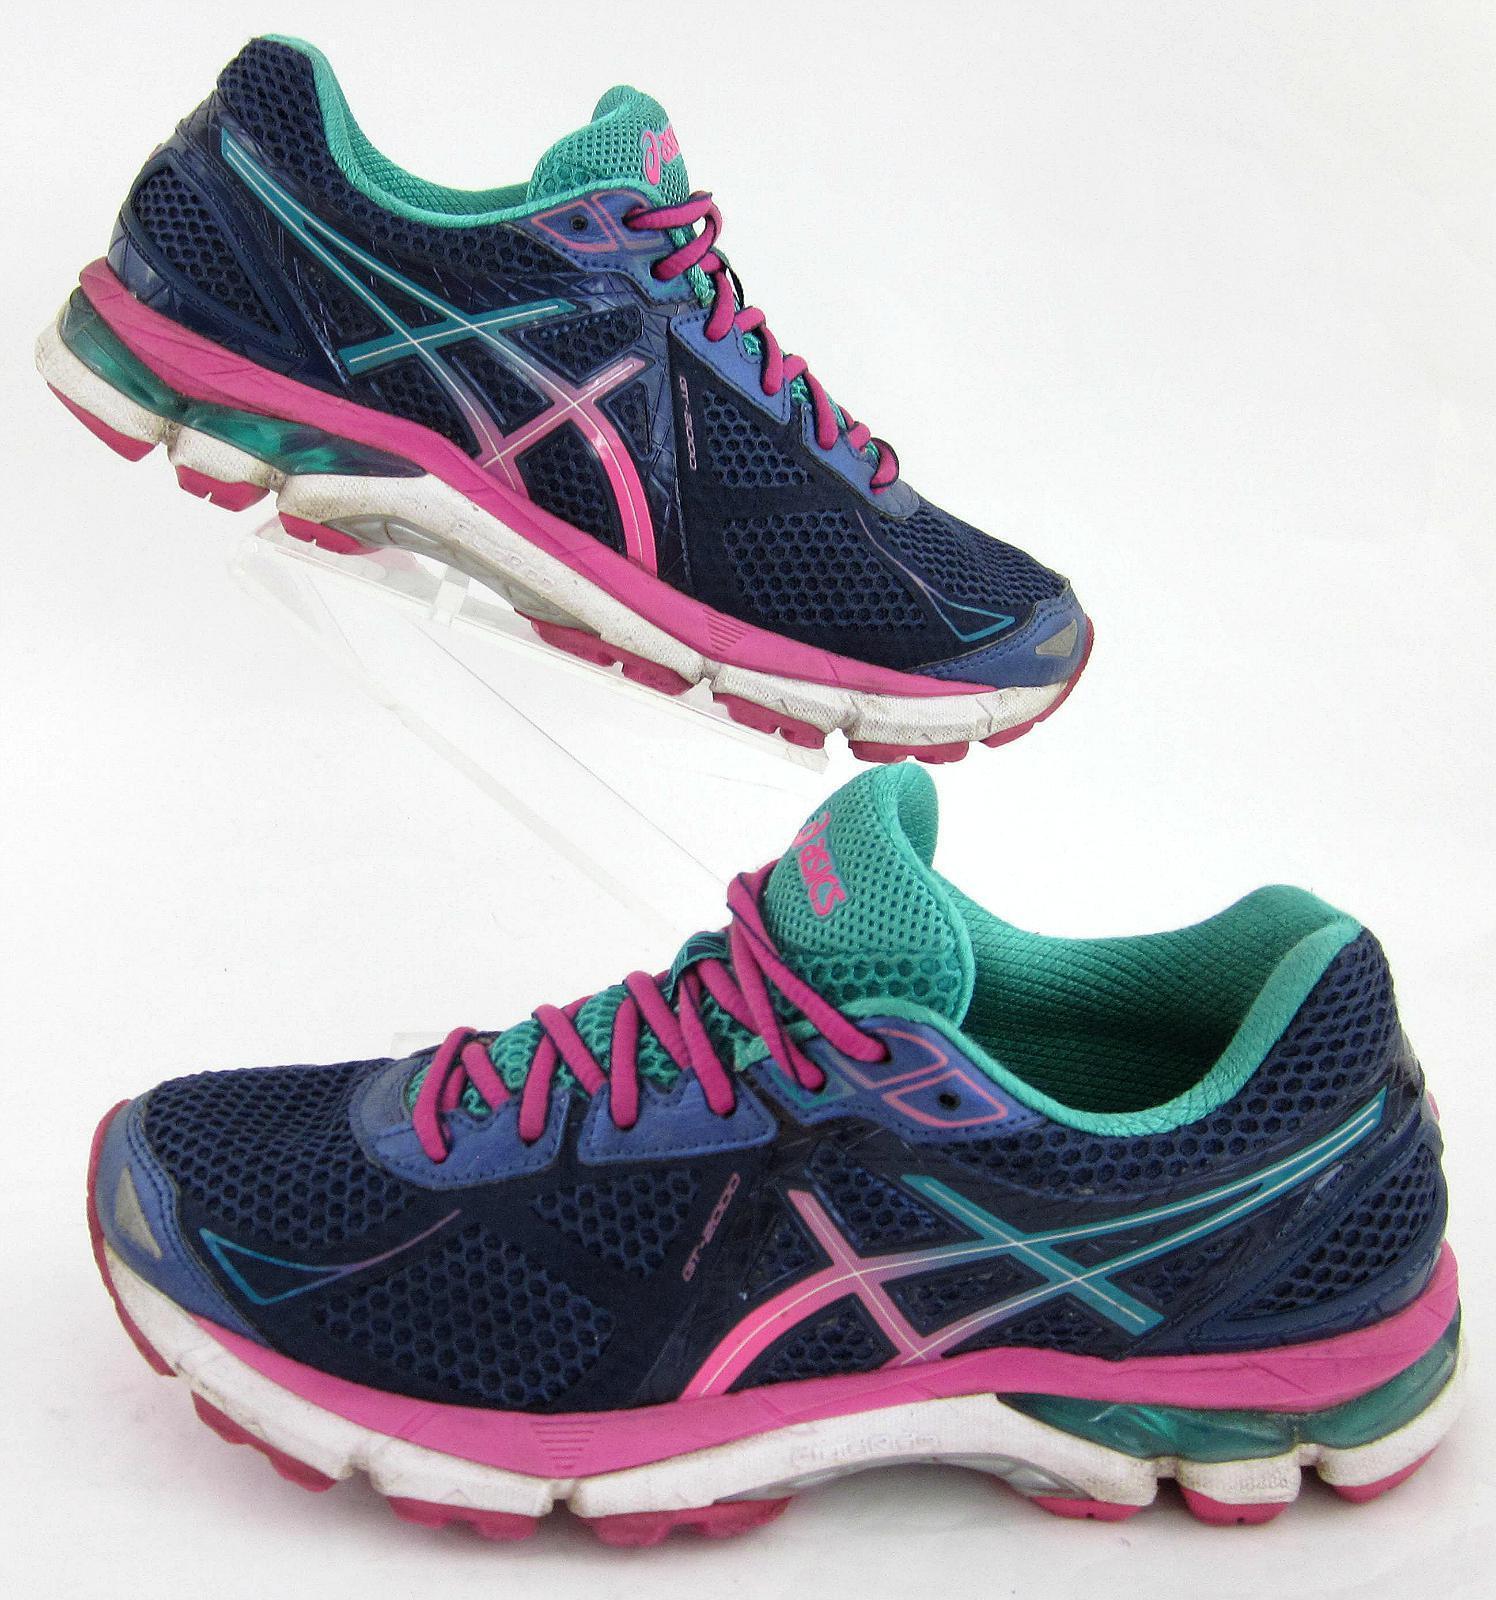 Asics GT-2000 V3 Womens Running shoes Navy Navy Navy bluee Hot Pink Green Sz 8 c3ac5f